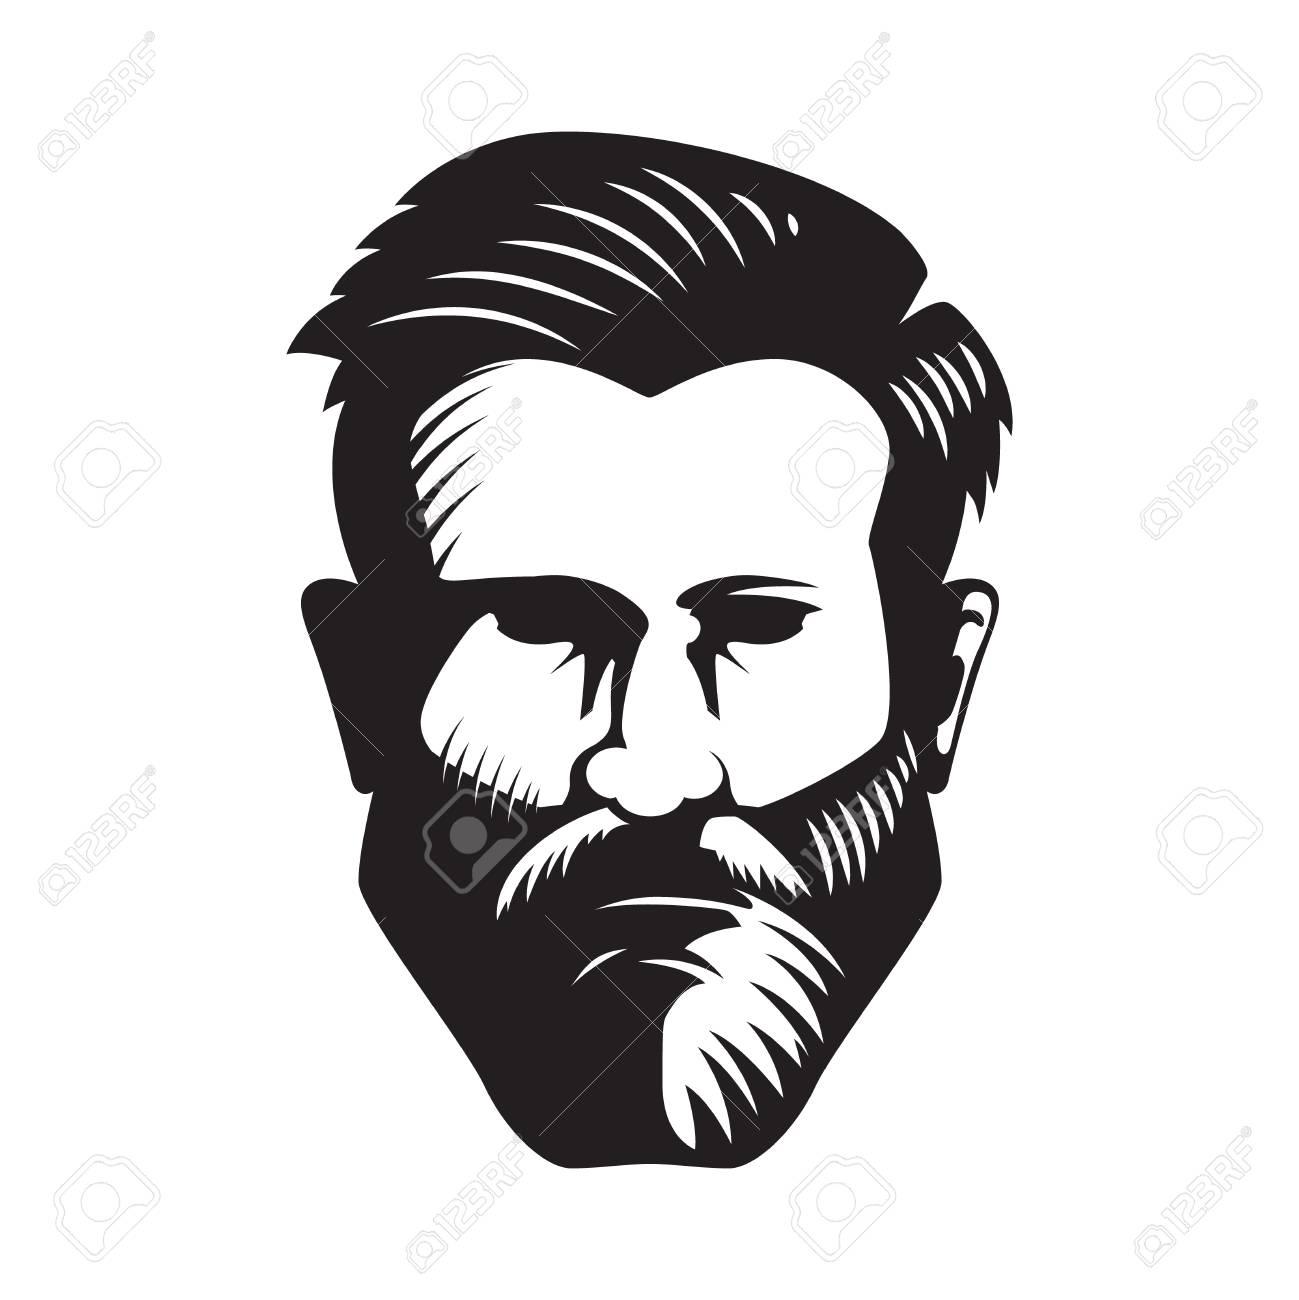 Bearded man head illustration isolated on white background. Design element for poster, emblem, sign, badge. Vector illustration - 88311351